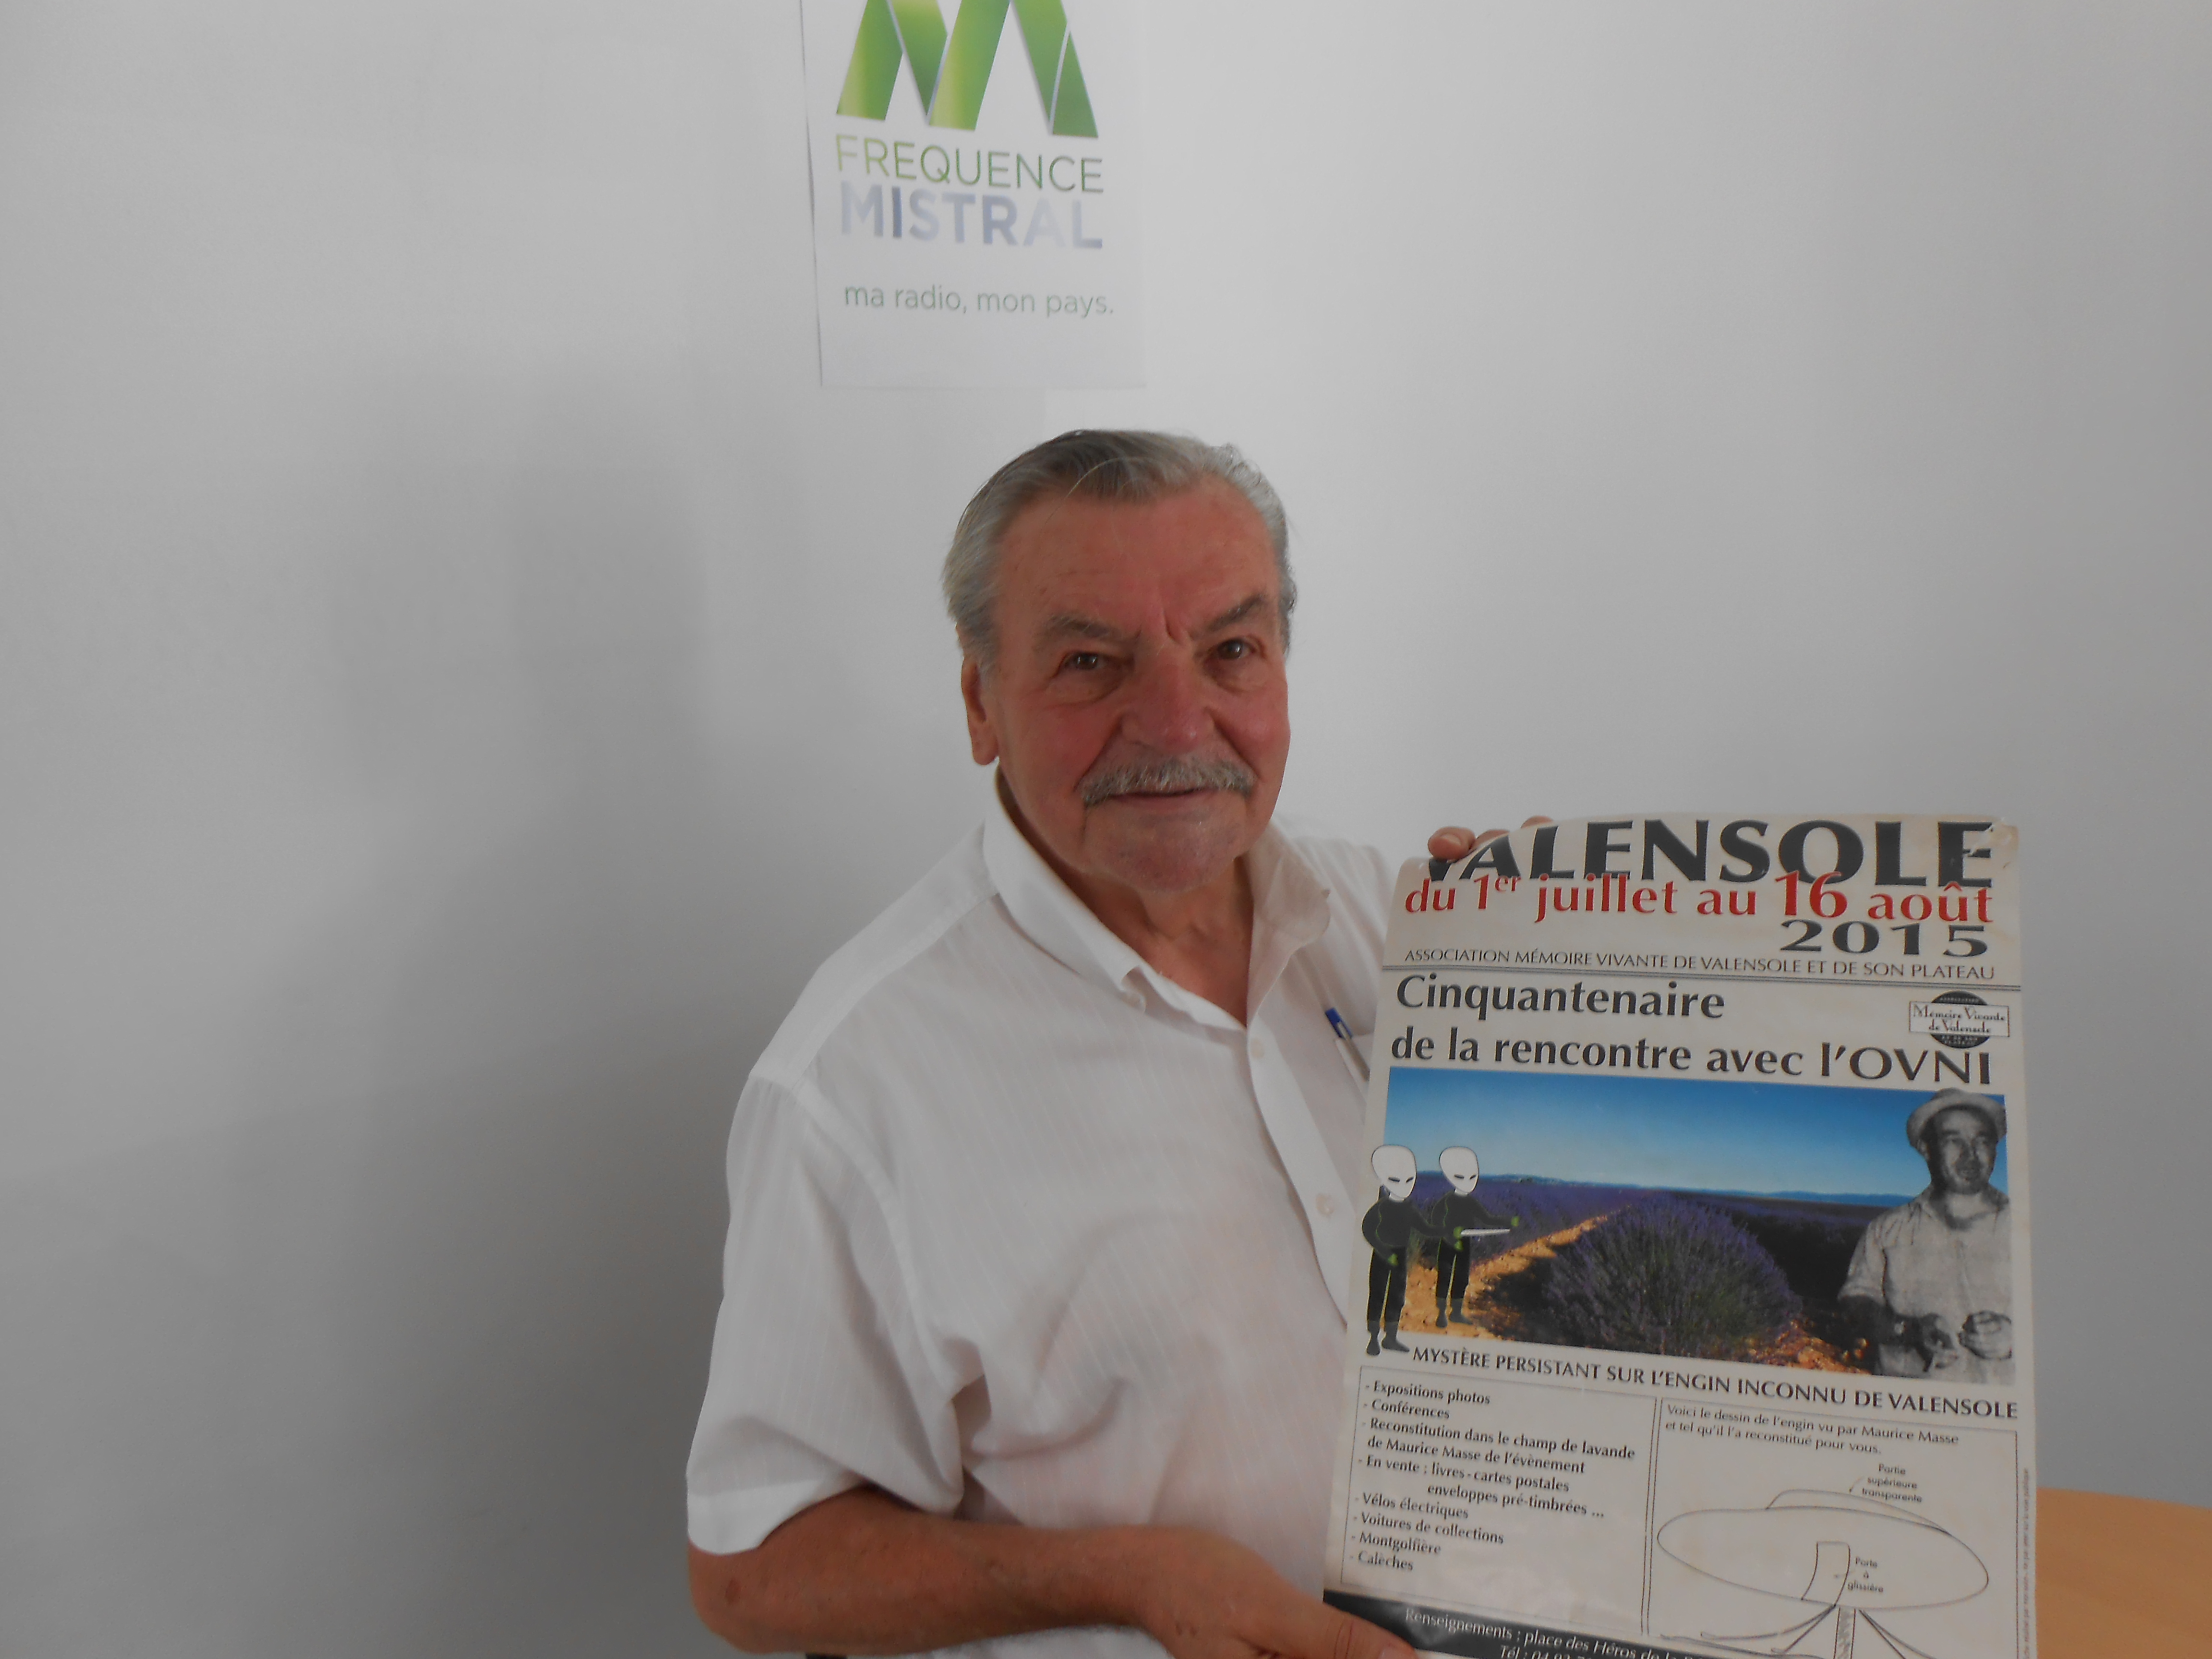 OVNI à Valensole : 50 ans plus tard